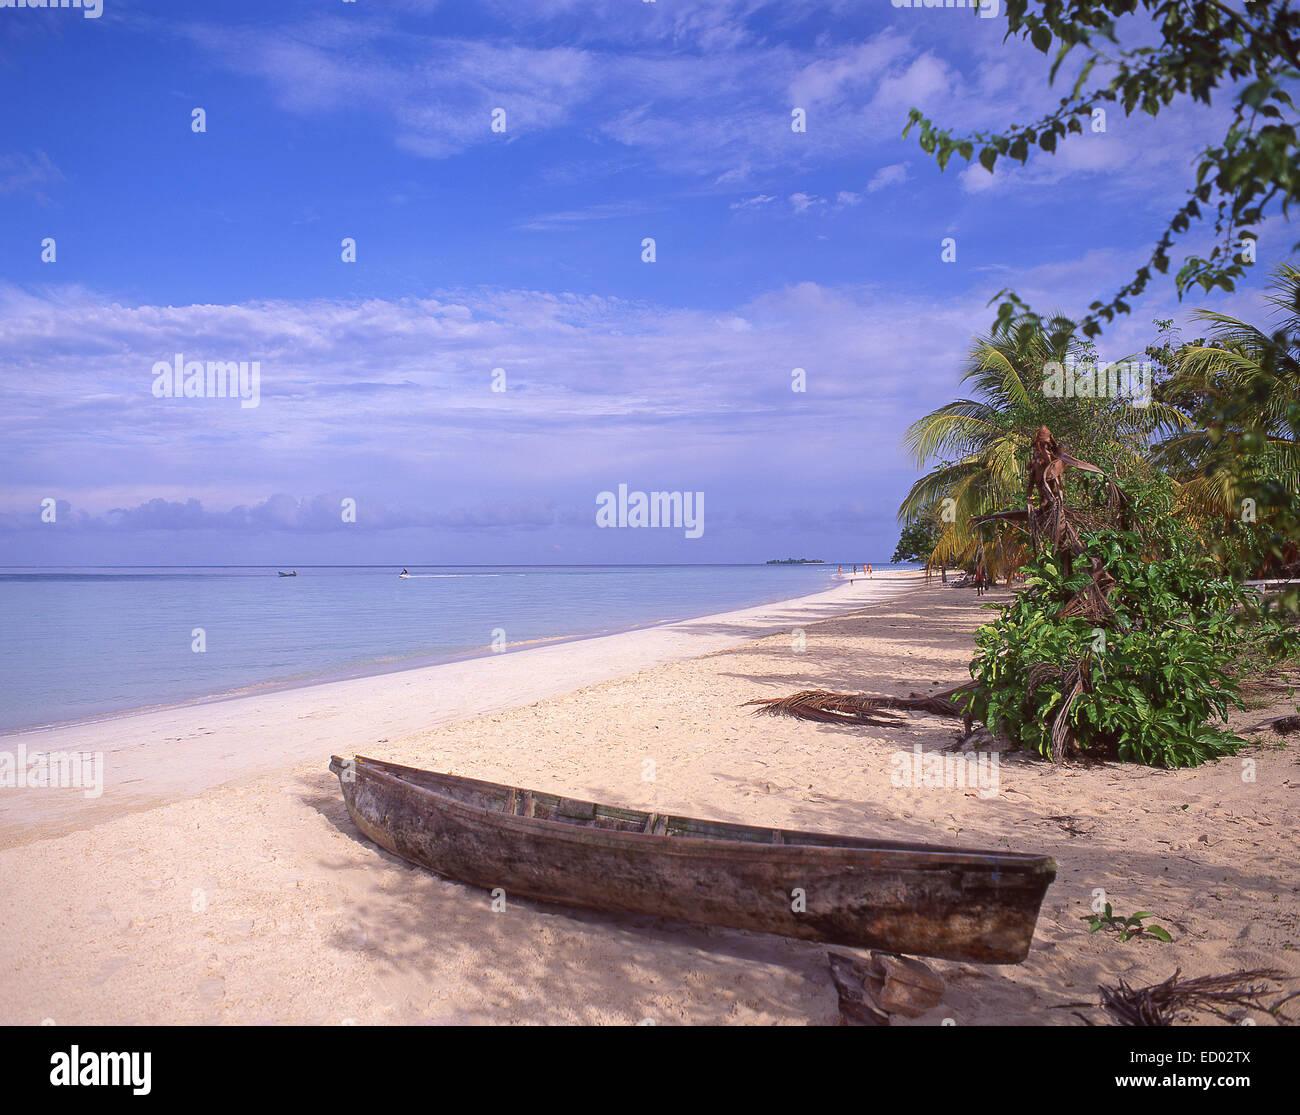 Dugout canoe on Negril Beach, Negril, Westmoreland Parish, Jamaica, Greater Antilles, Caribbean - Stock Image